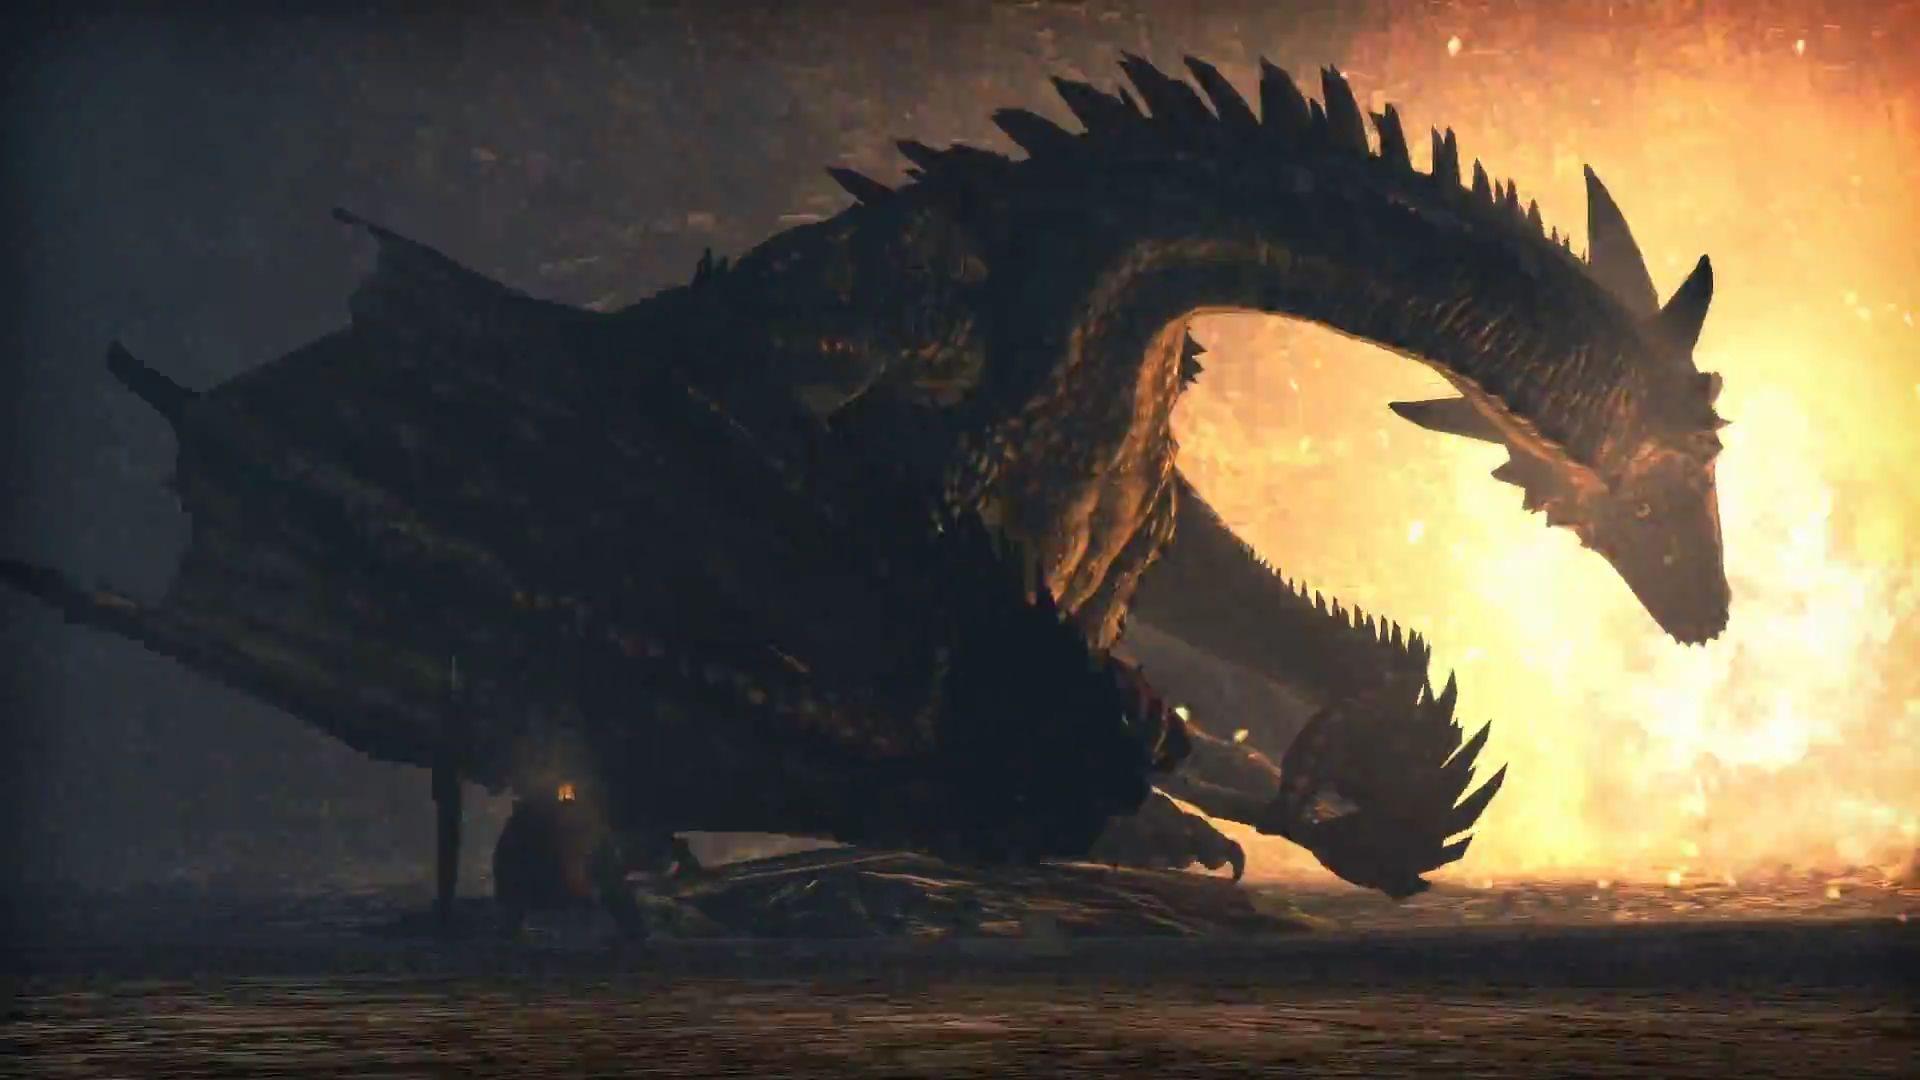 Dragon S Dogma Hd Wallpaper Dragon S Dogma 1899168 Hd